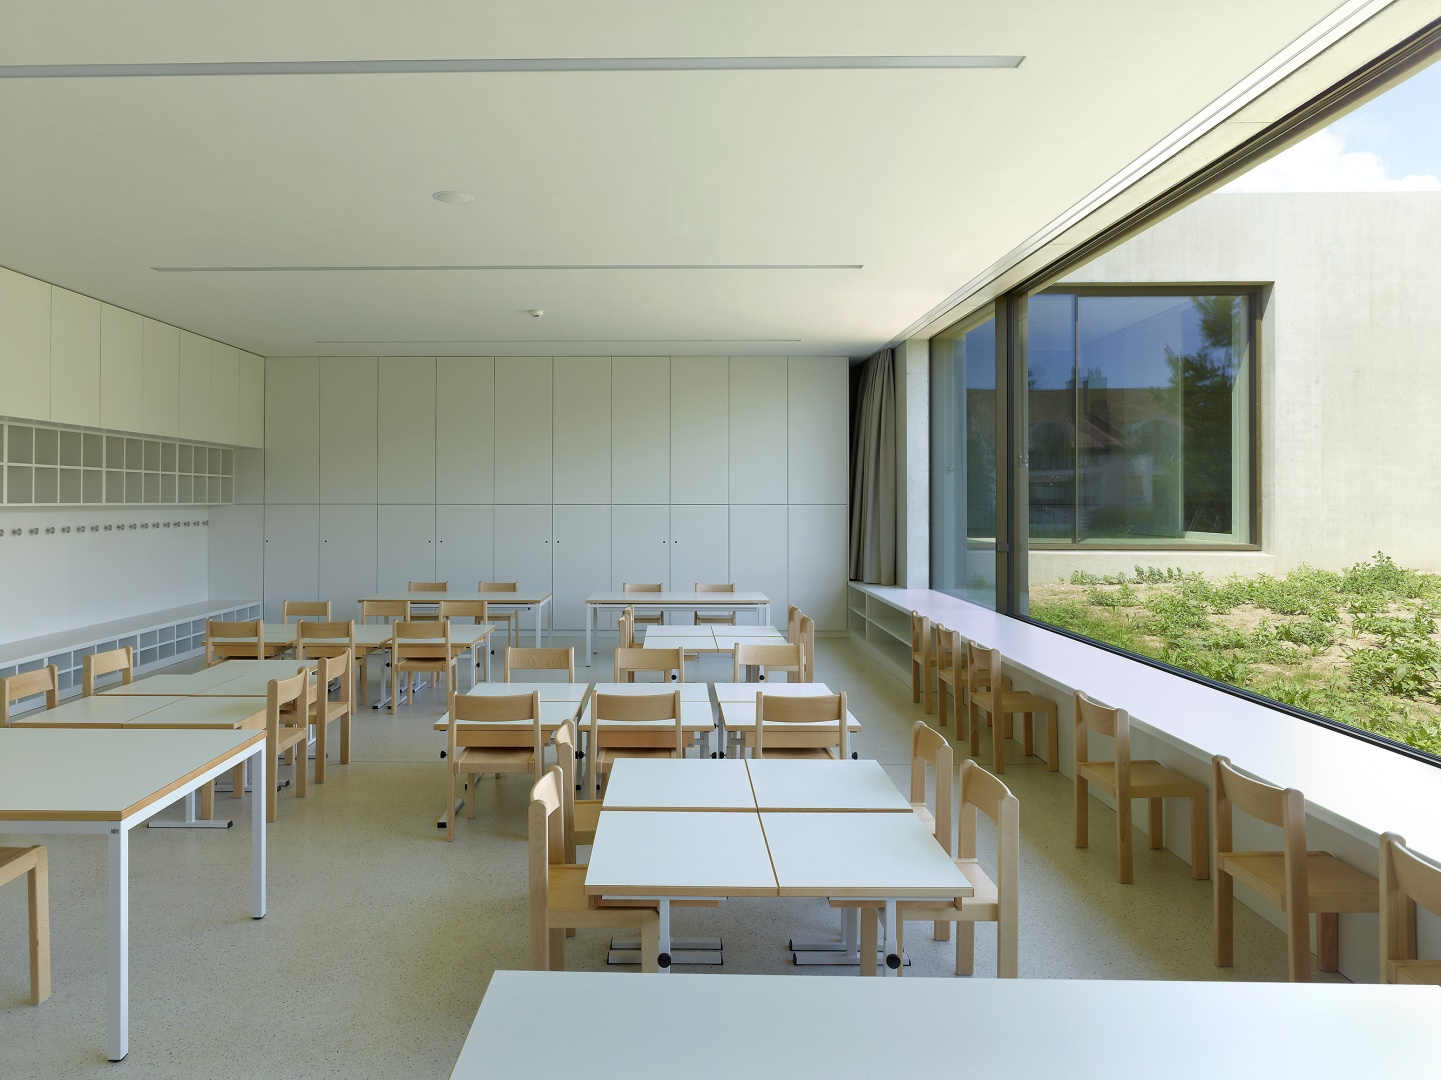 salle classe © Thomas Jantscher